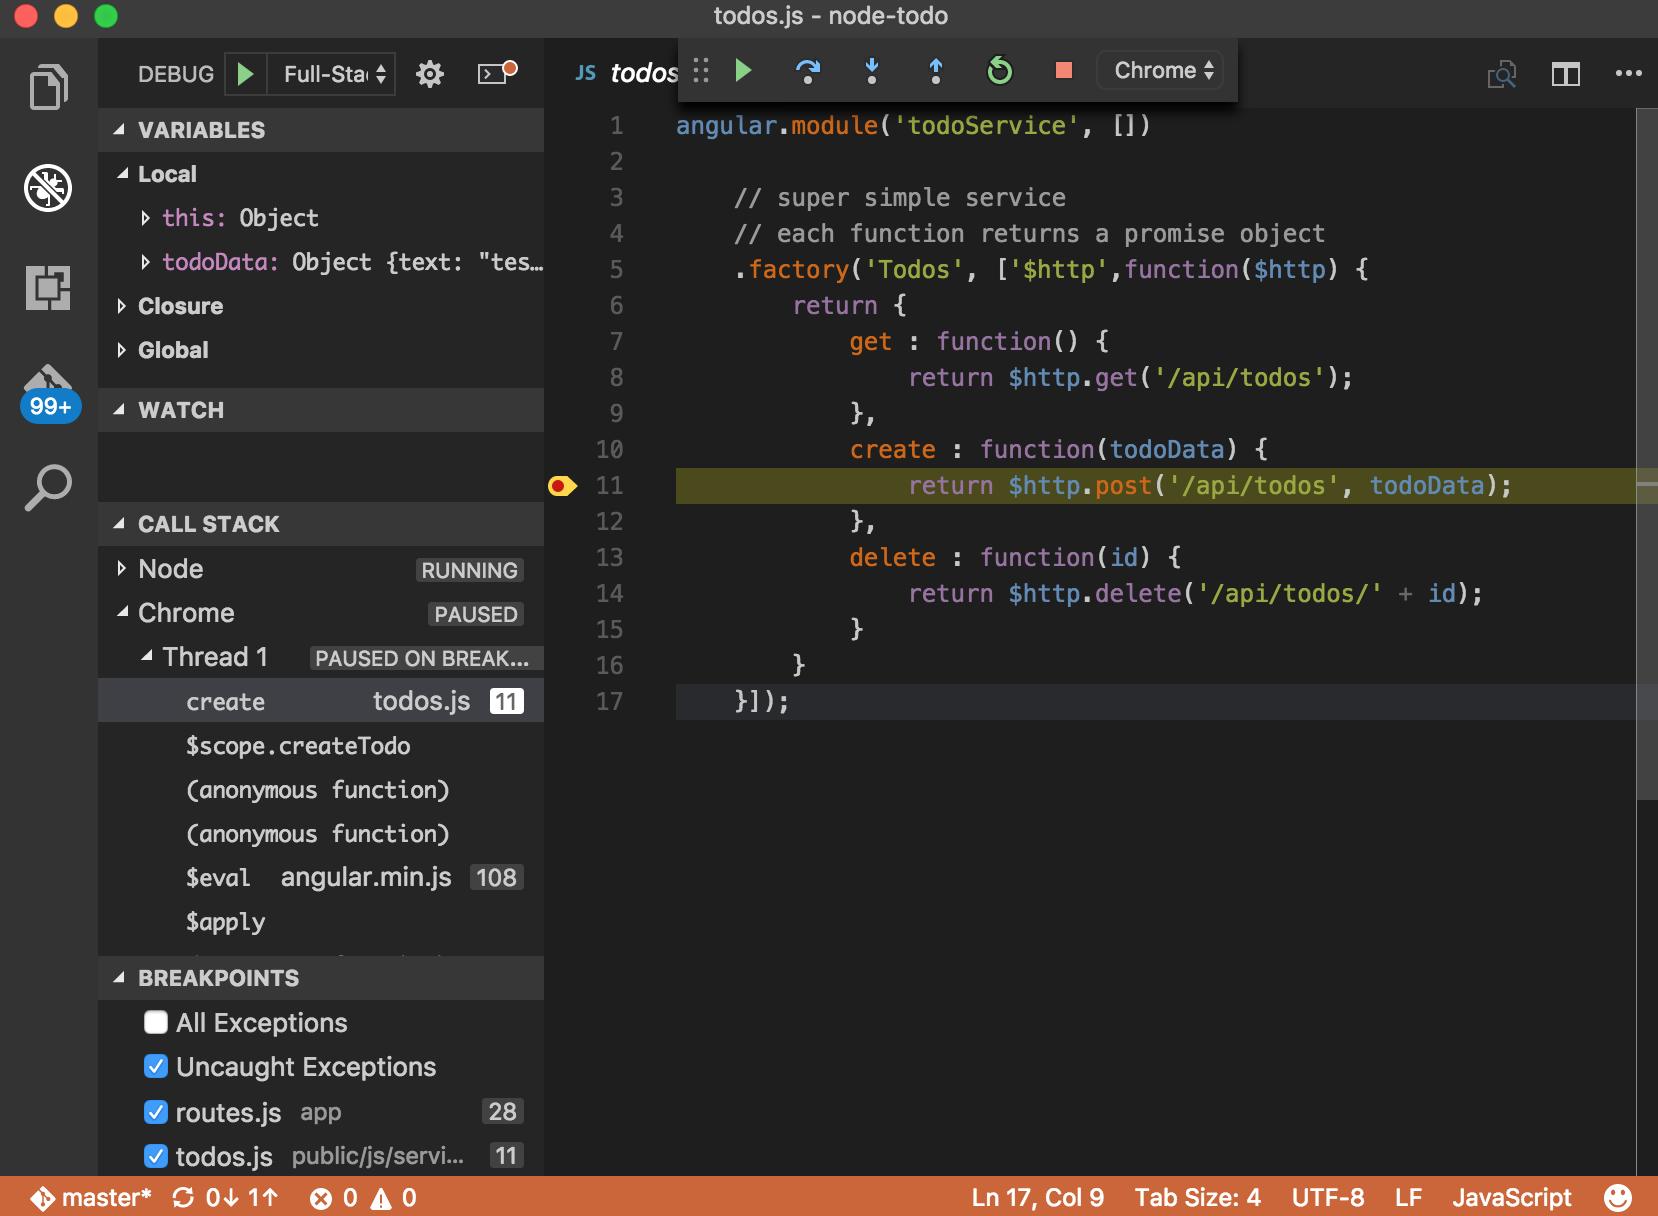 Node js Development with Visual Studio Code and Azure